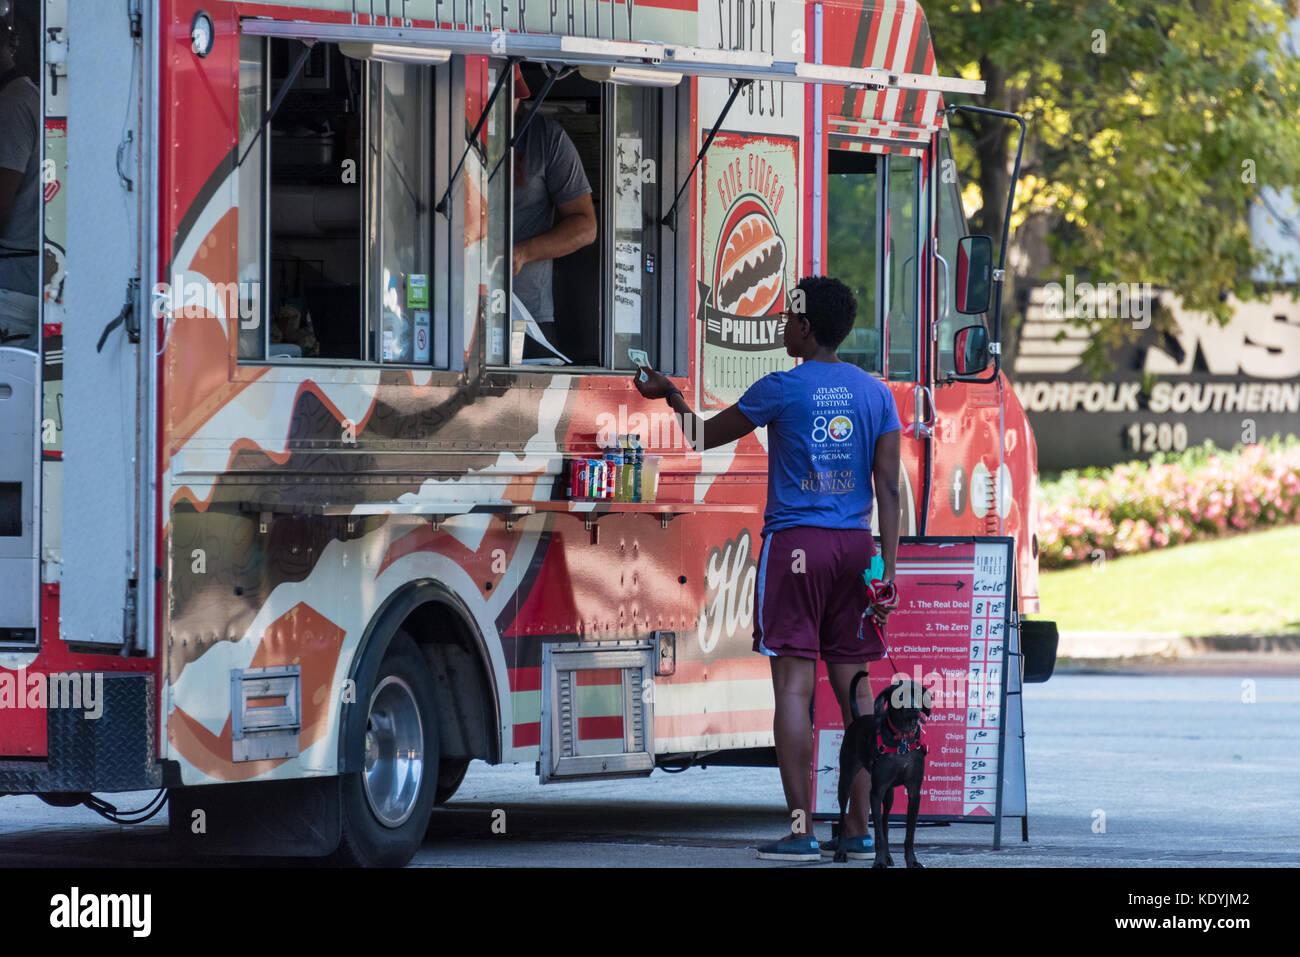 Food truck vendor at Colony Square on Peachtree Street in Midtown Atlanta, Georgia. (USA) - Stock Image